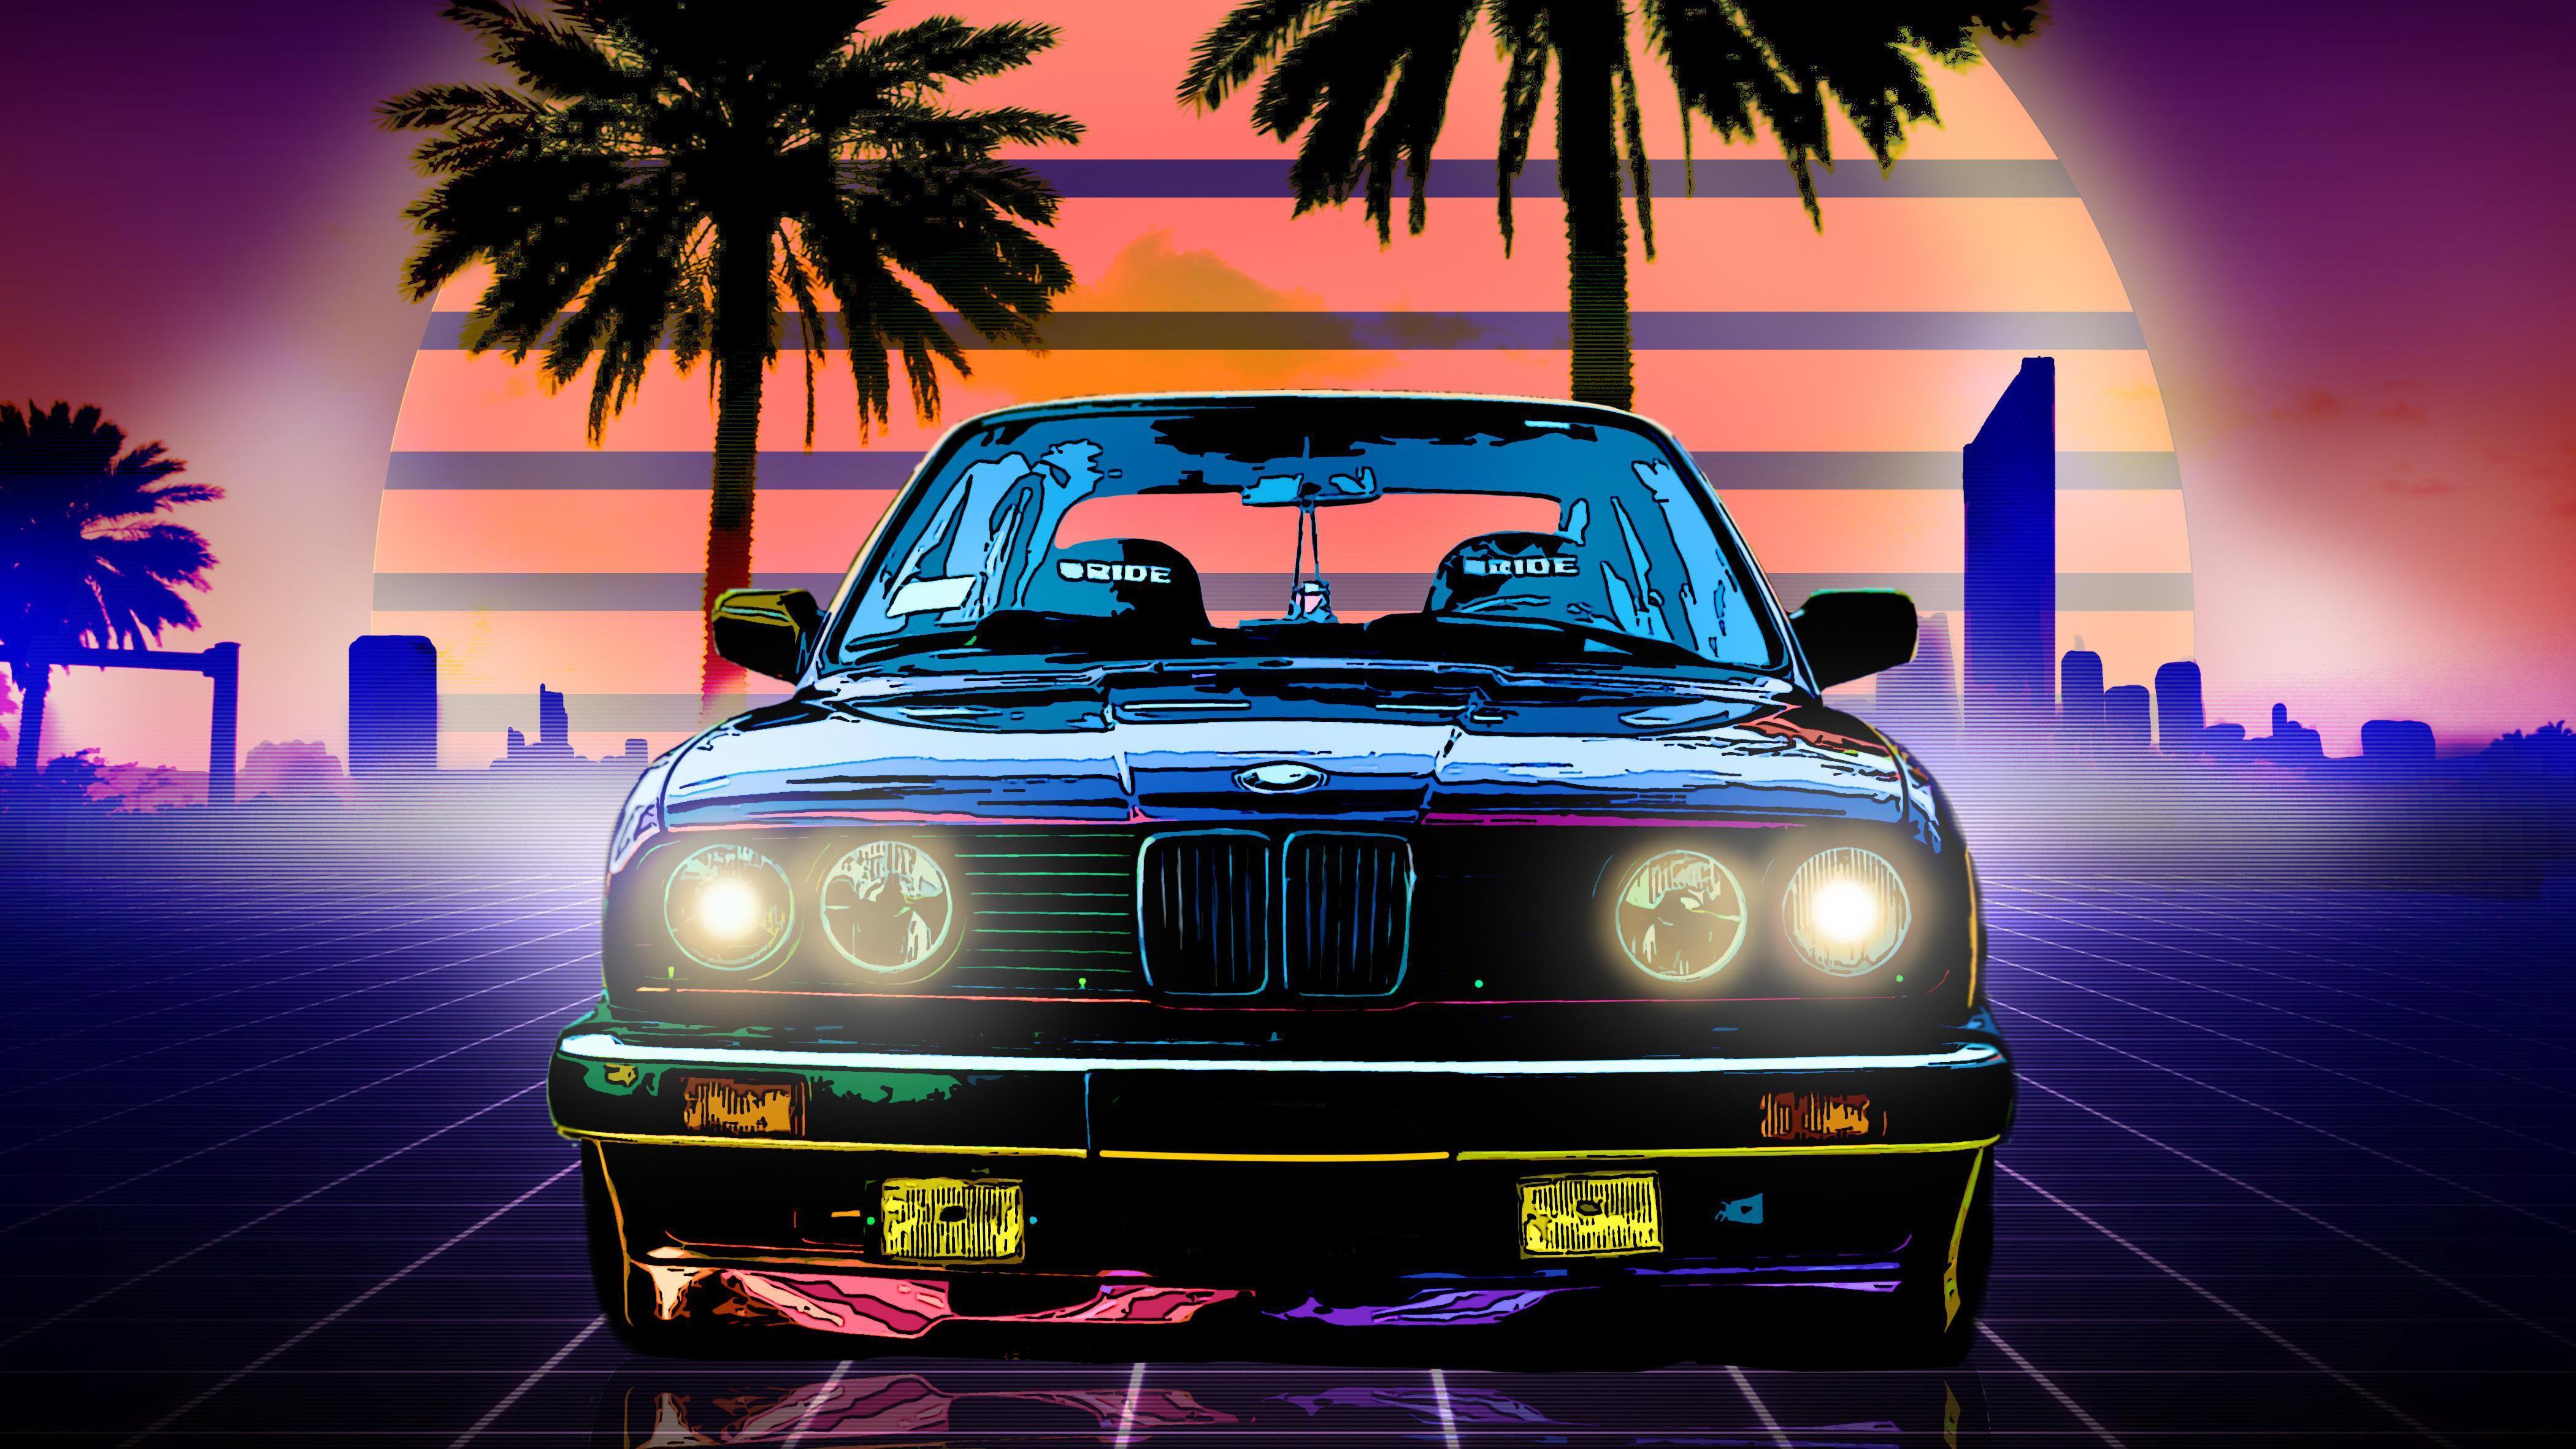 BMW E30 Desktop Wallpapers - Wallpaper Cave